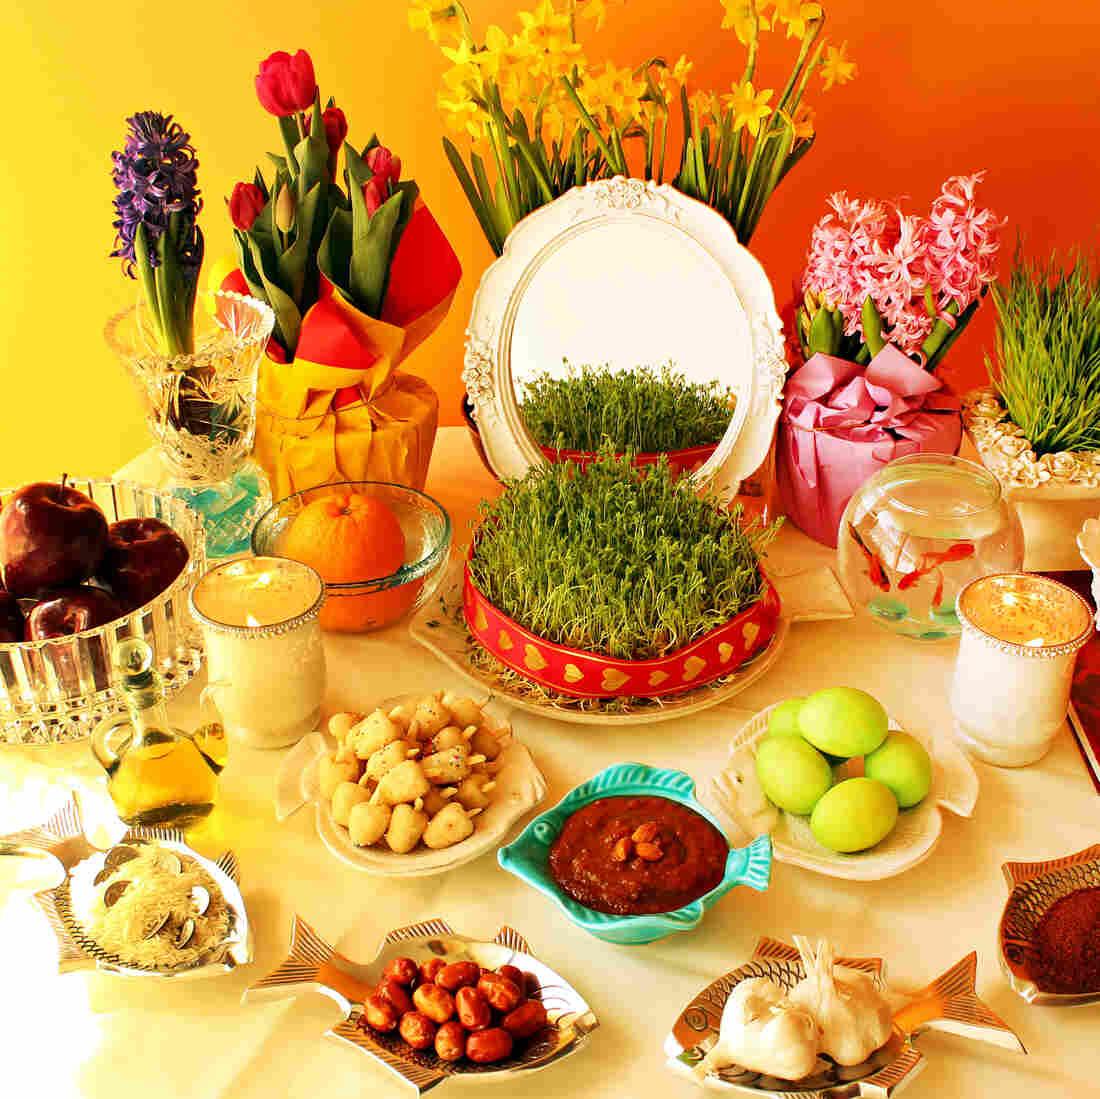 Persian New Year's Table Celebrates Nature's Rebirth Deliciously